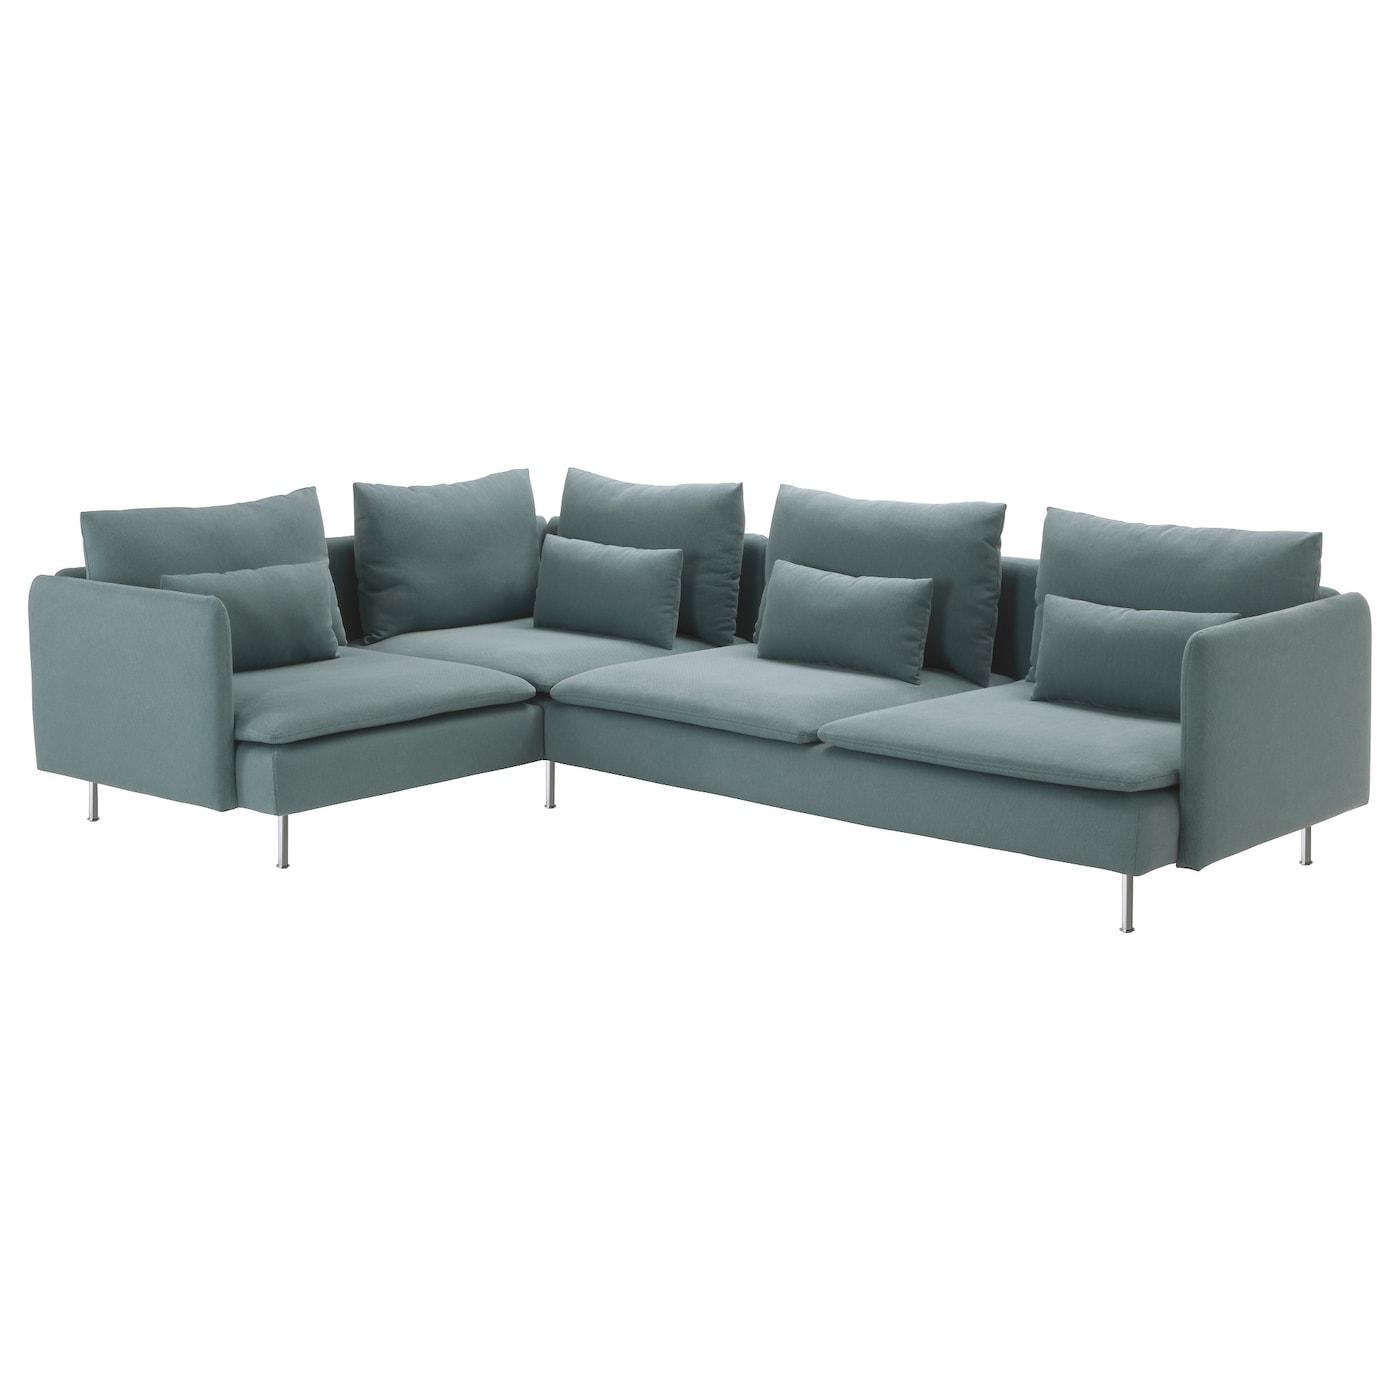 Ikea Ecksofa söderhamn 4er sofa mit récamiere samsta hellrosa ikea